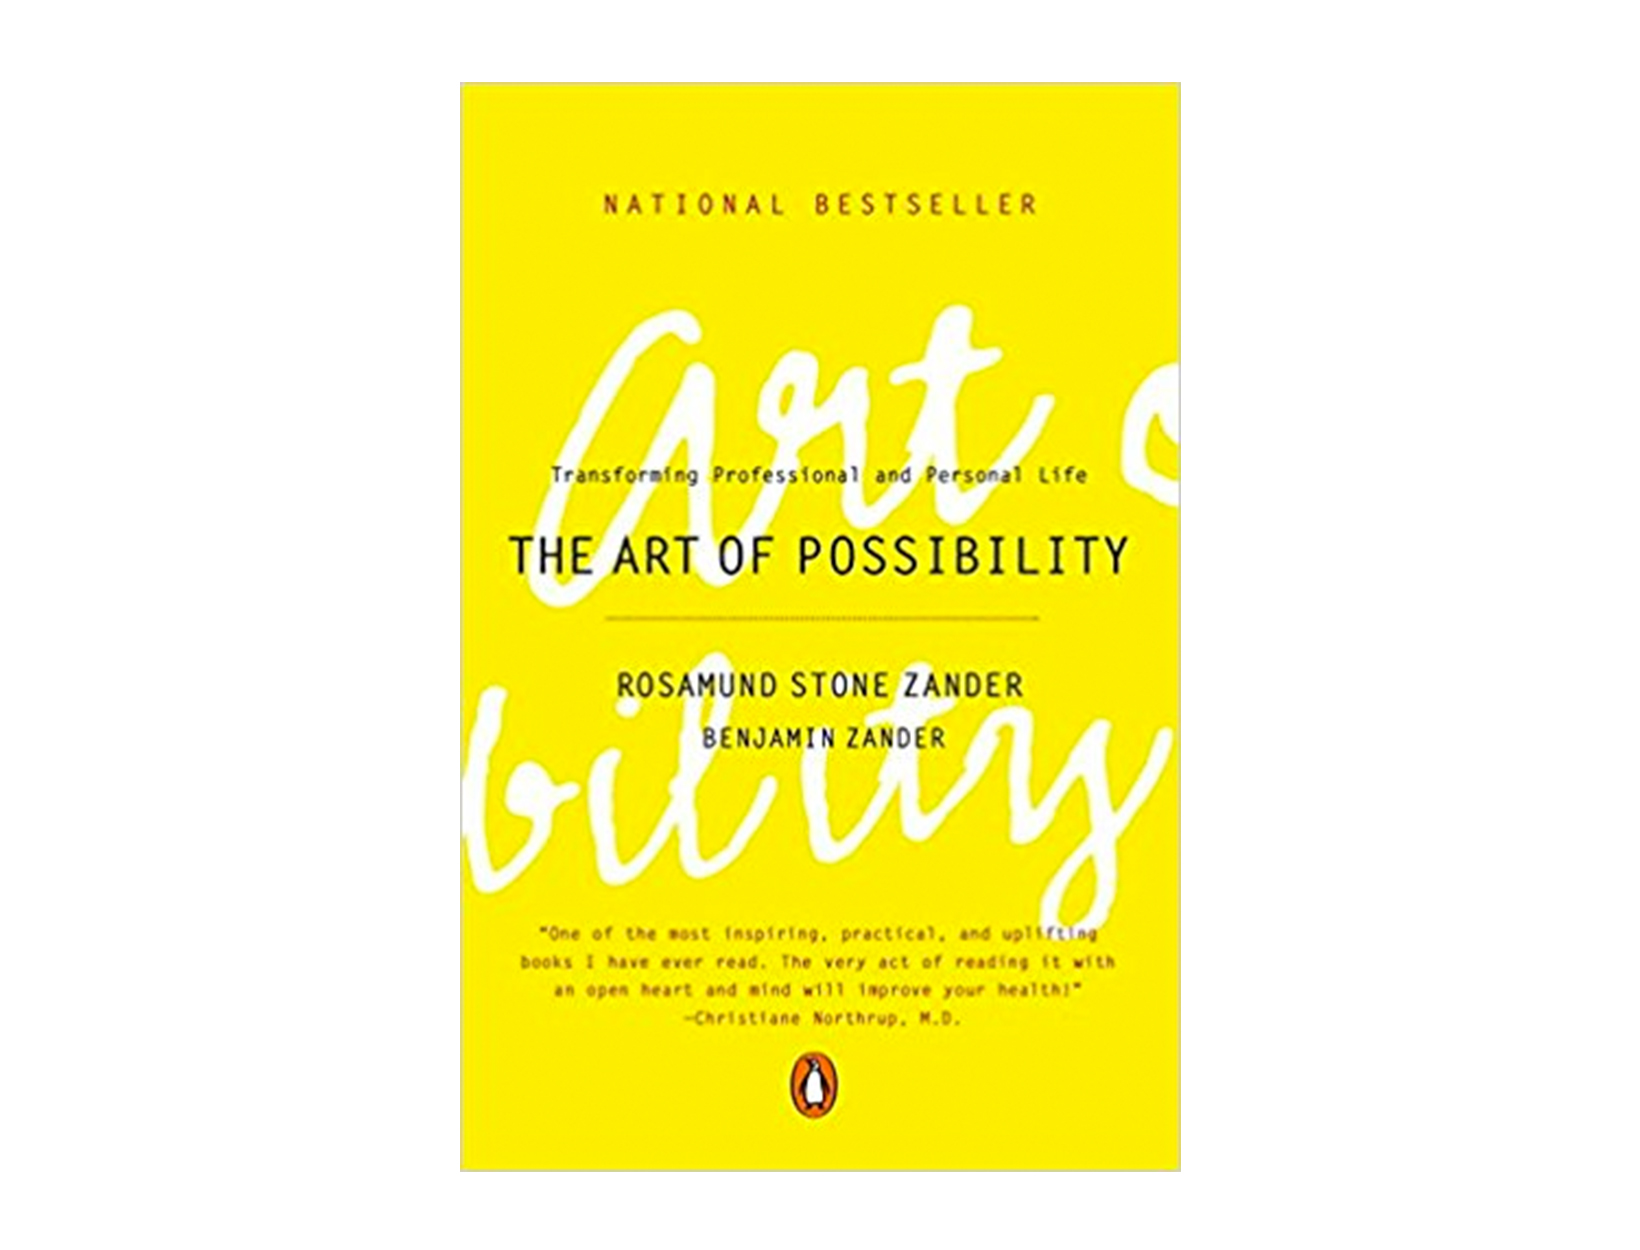 The Art of Possibility by Rosamund Stone Zander and Benjamin Zander